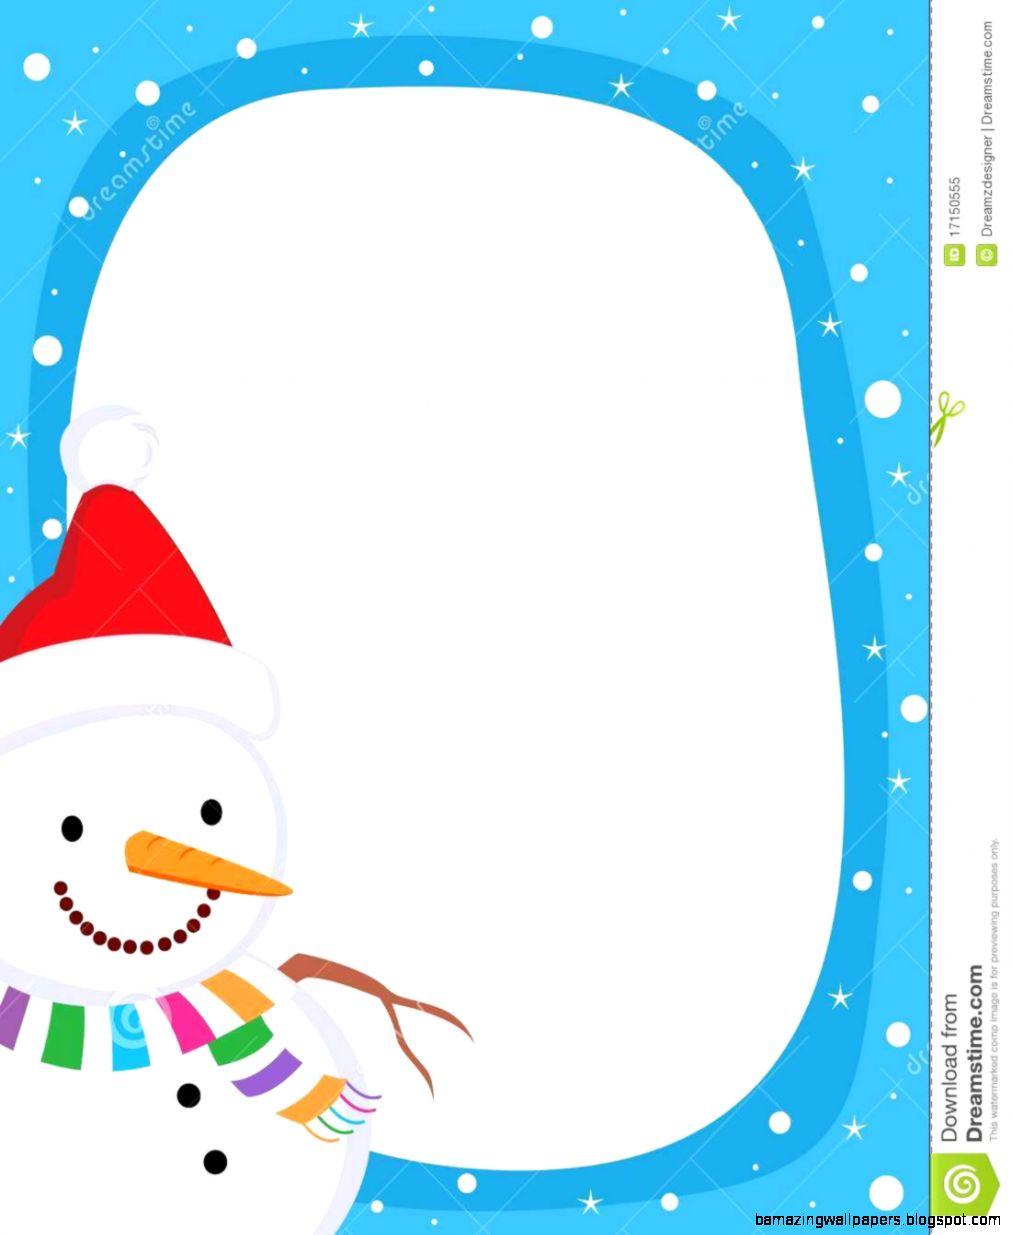 Snowman Border  Frame Royalty Free Stock Photo   Image 17150555